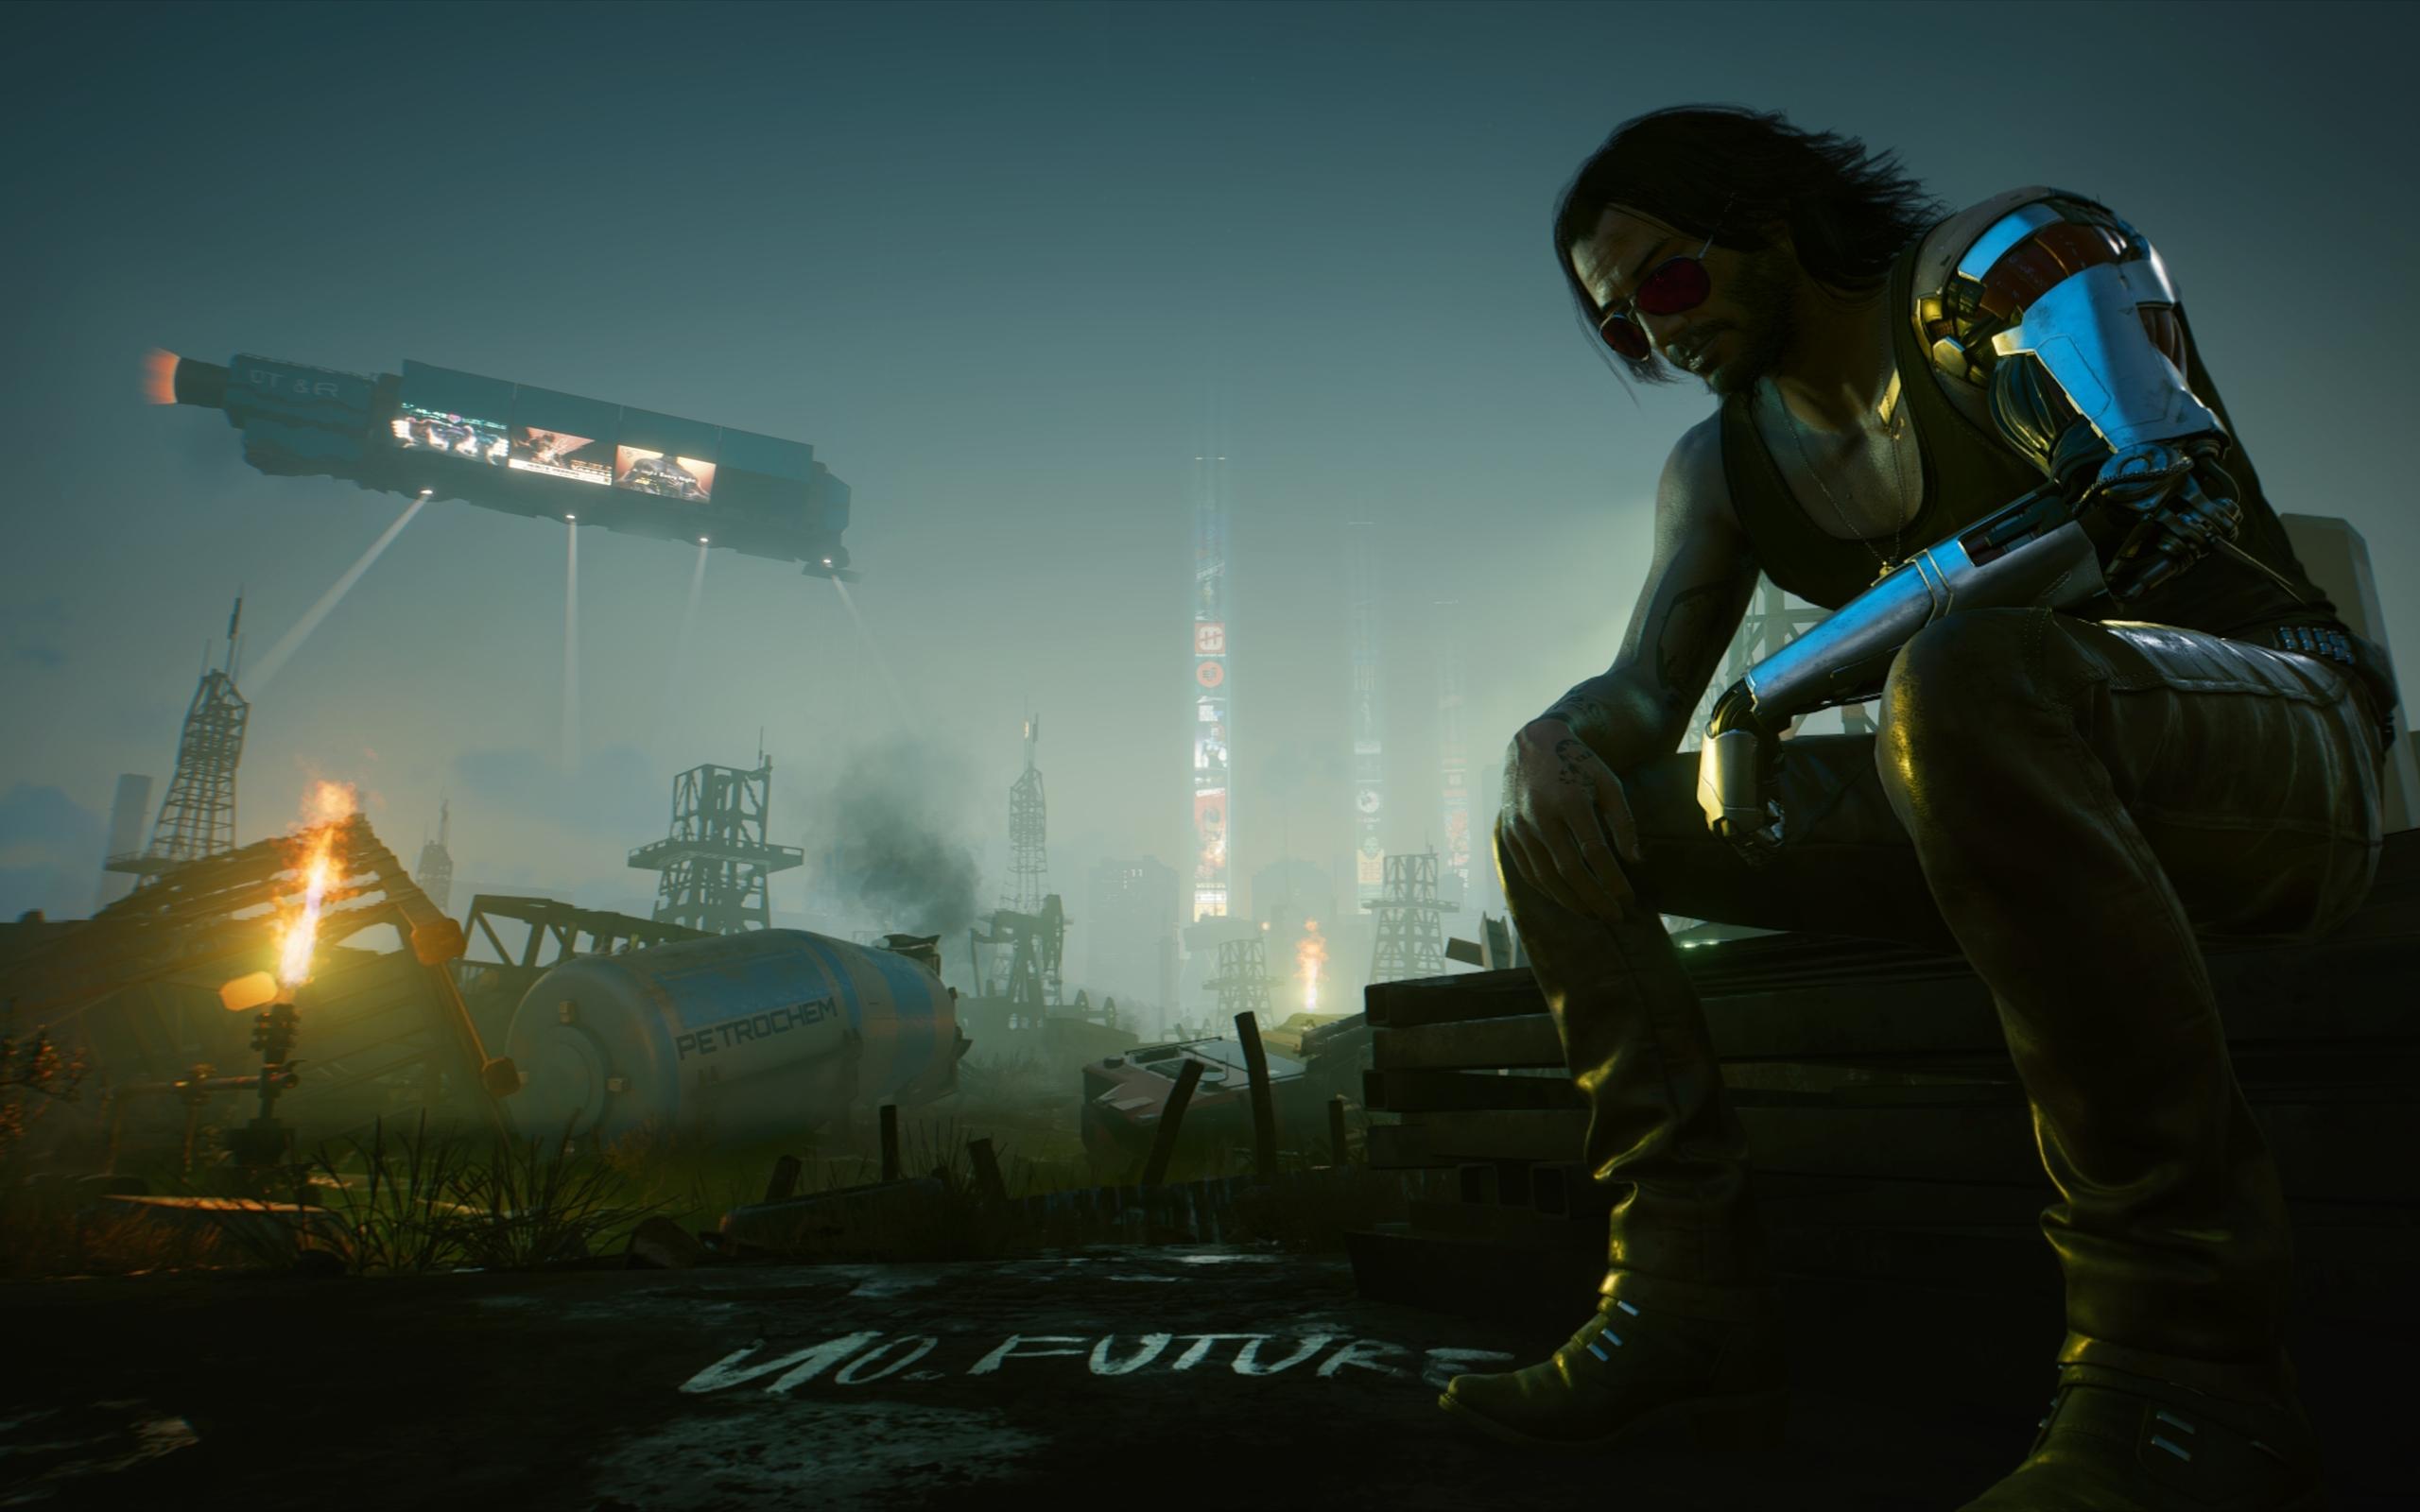 cyberpunk-2077-johnny-silverhand-game-night-city-wire-qd.jpg